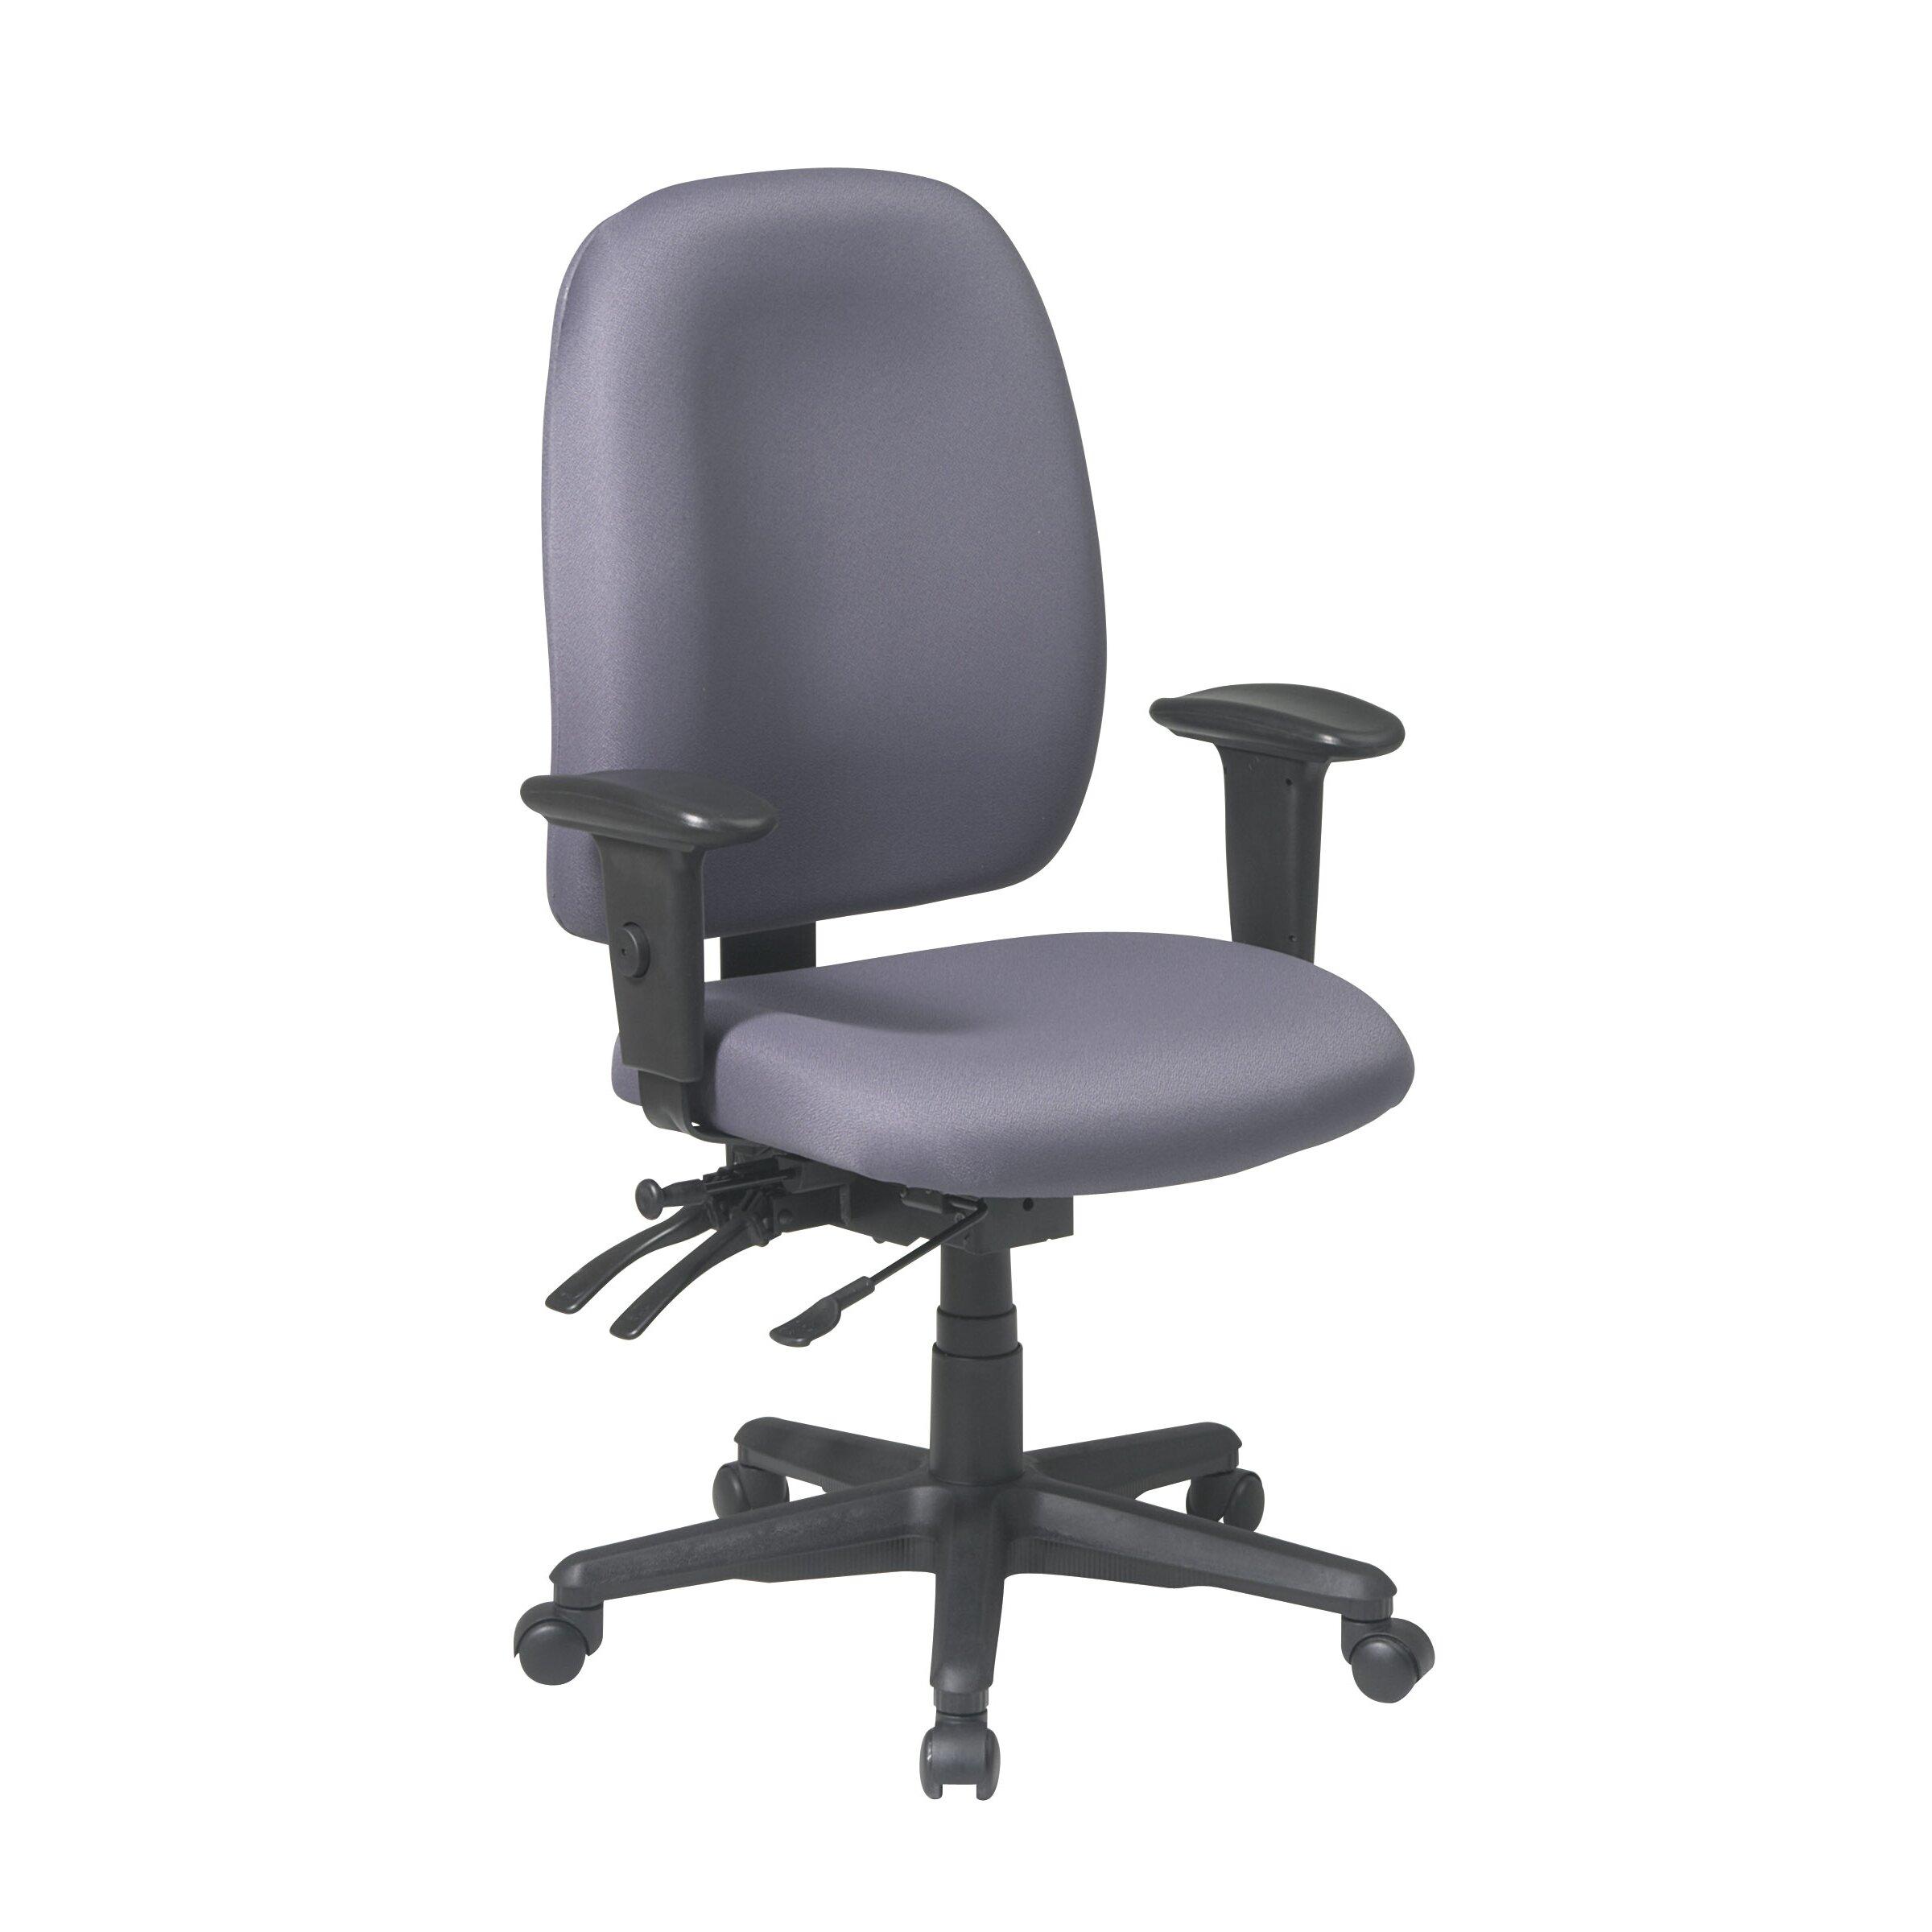 office star ergonomic high back desk chair reviews wayfair. Black Bedroom Furniture Sets. Home Design Ideas